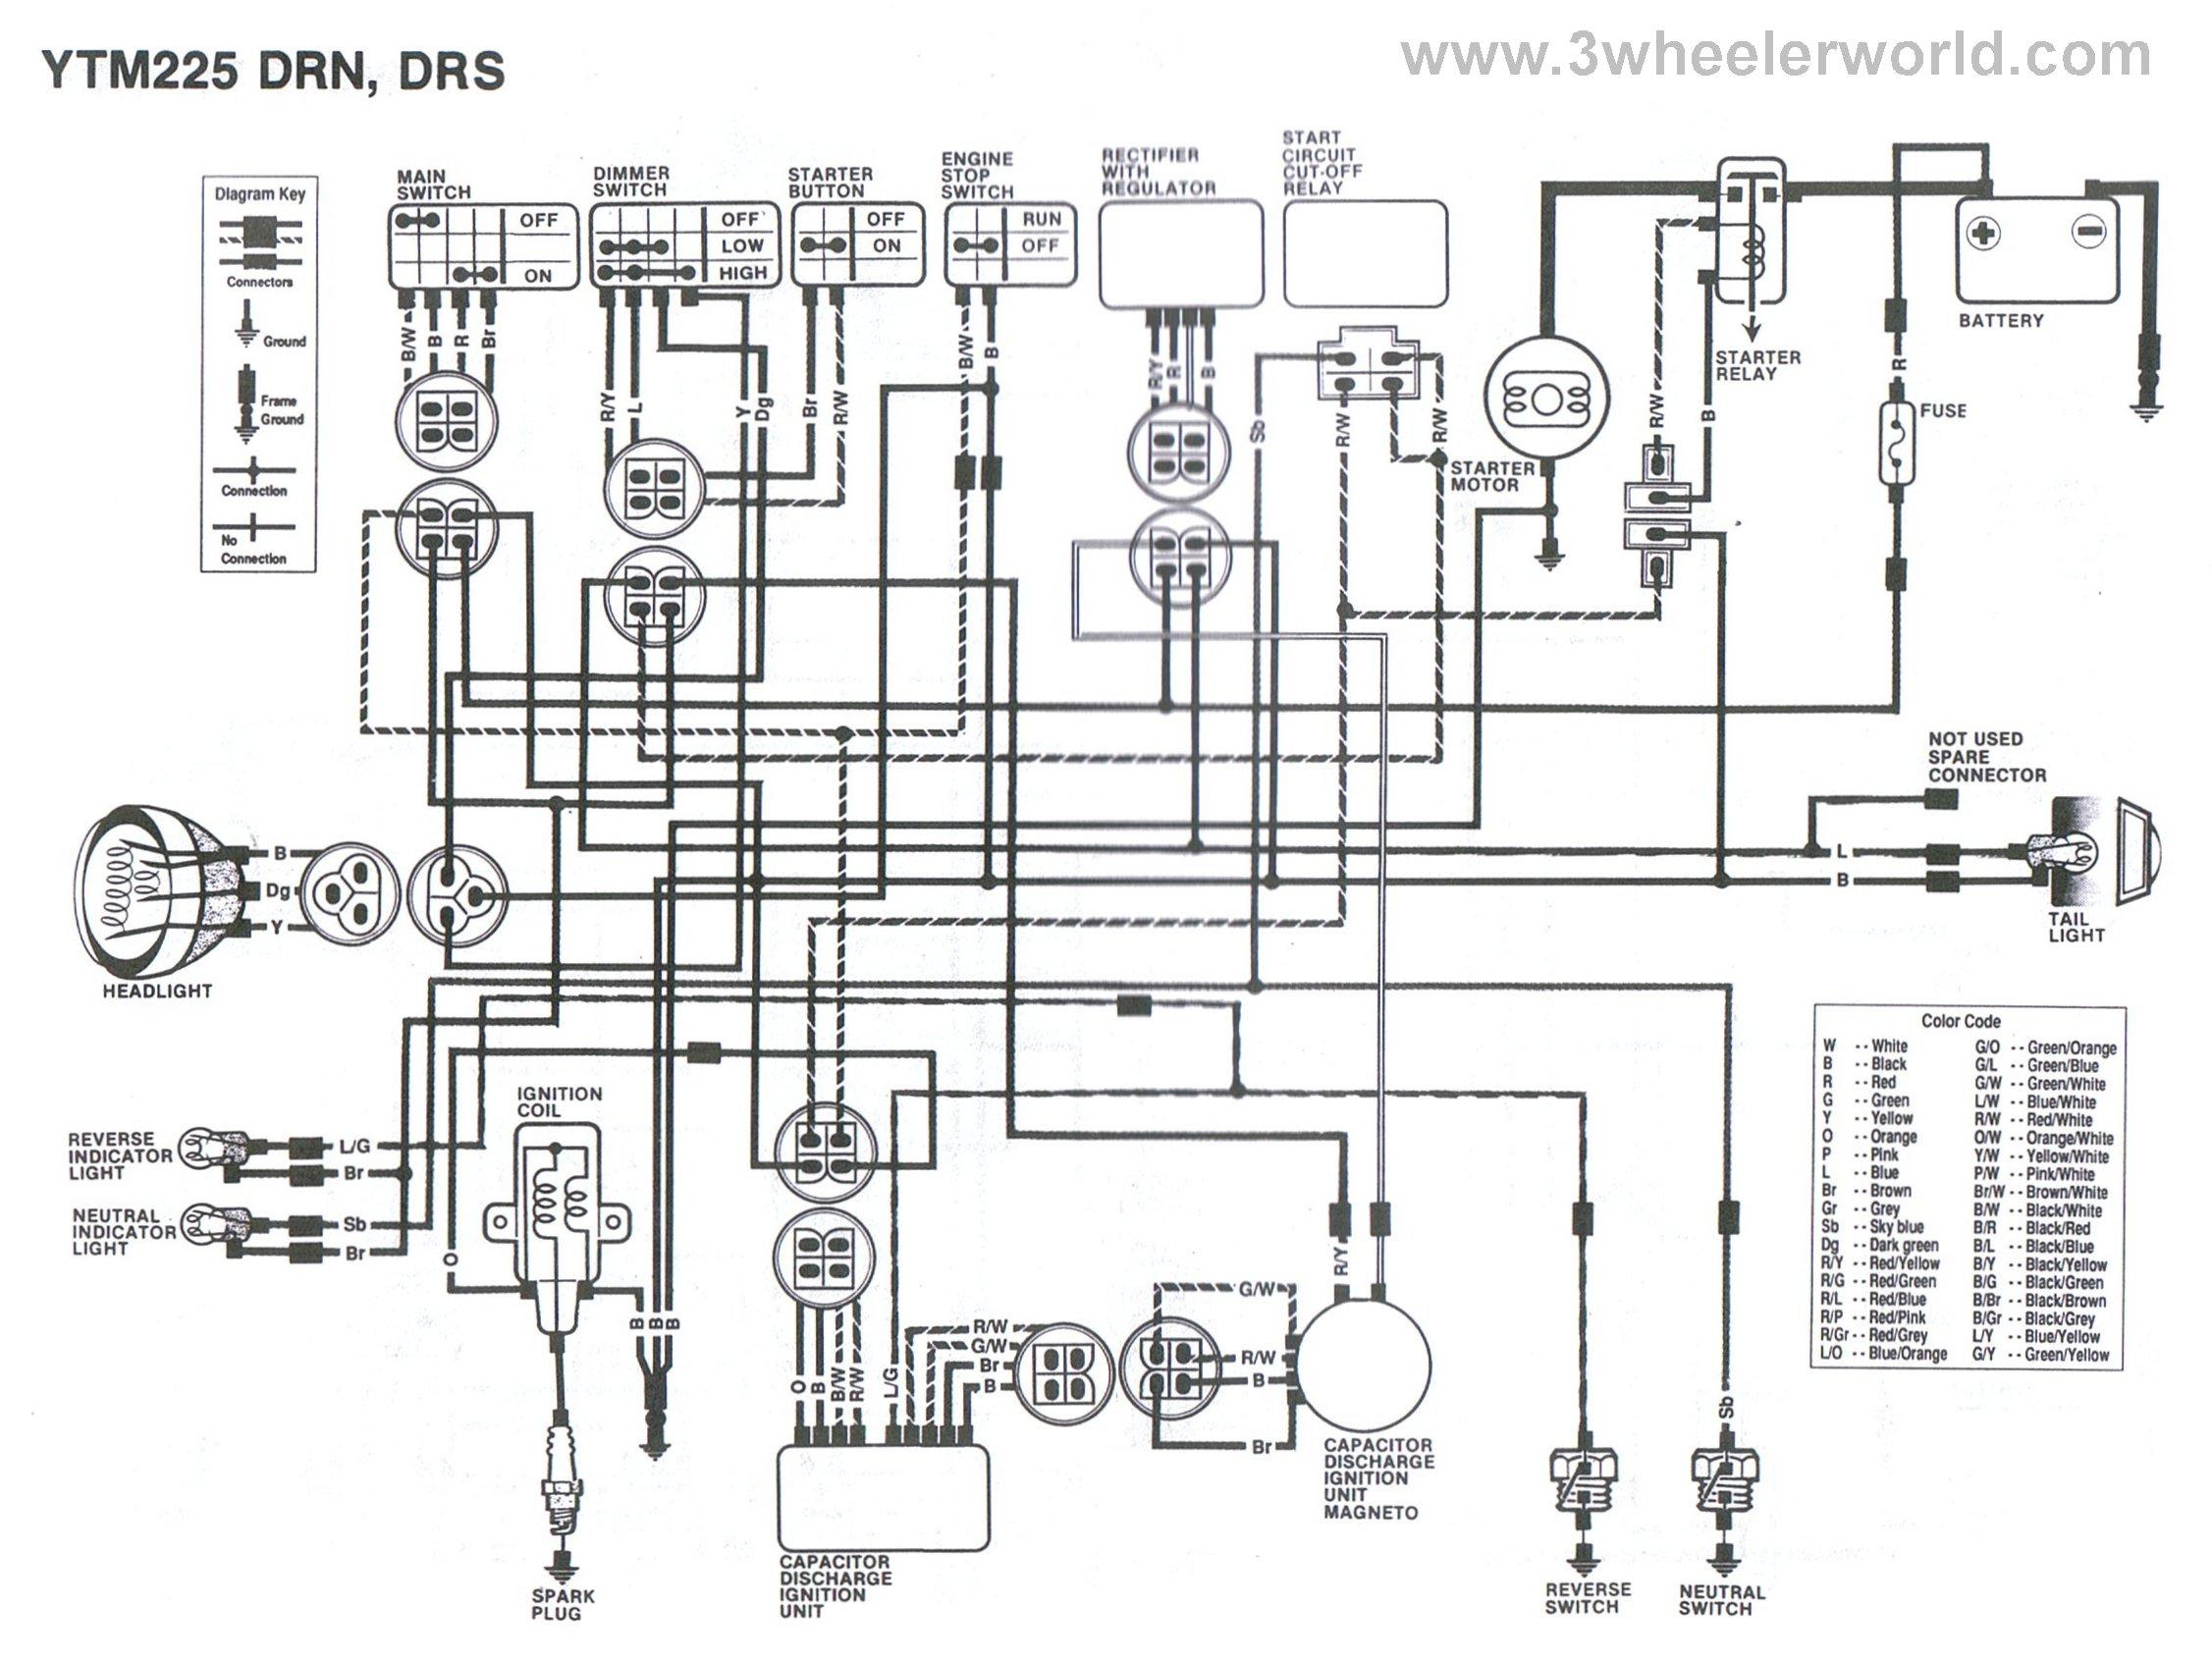 Groovy Yamaha Mint Wiring Diagram Wiring Diagram Wiring Cloud Filiciilluminateatxorg